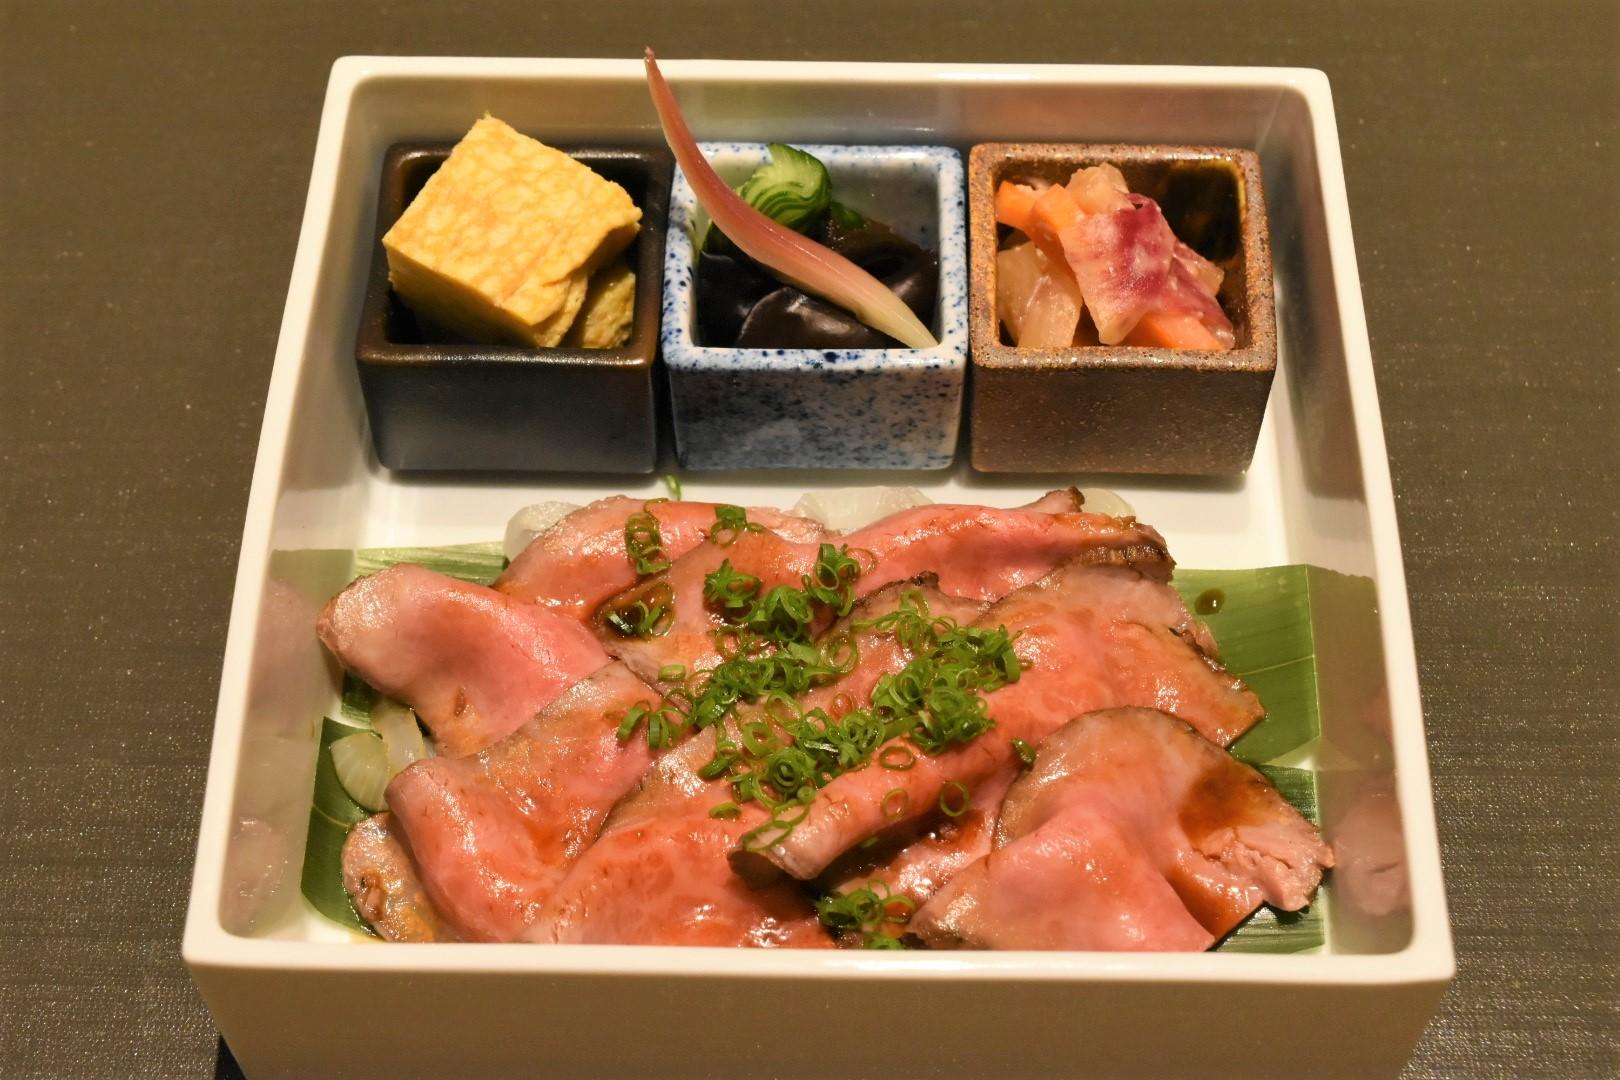 ginza-%e8%b1%89-kuki-ginza-japanese-restaurant-%e9%8a%80%e5%ba%a7%e6%97%a5%e6%9c%ac%e6%96%99%e7%90%861